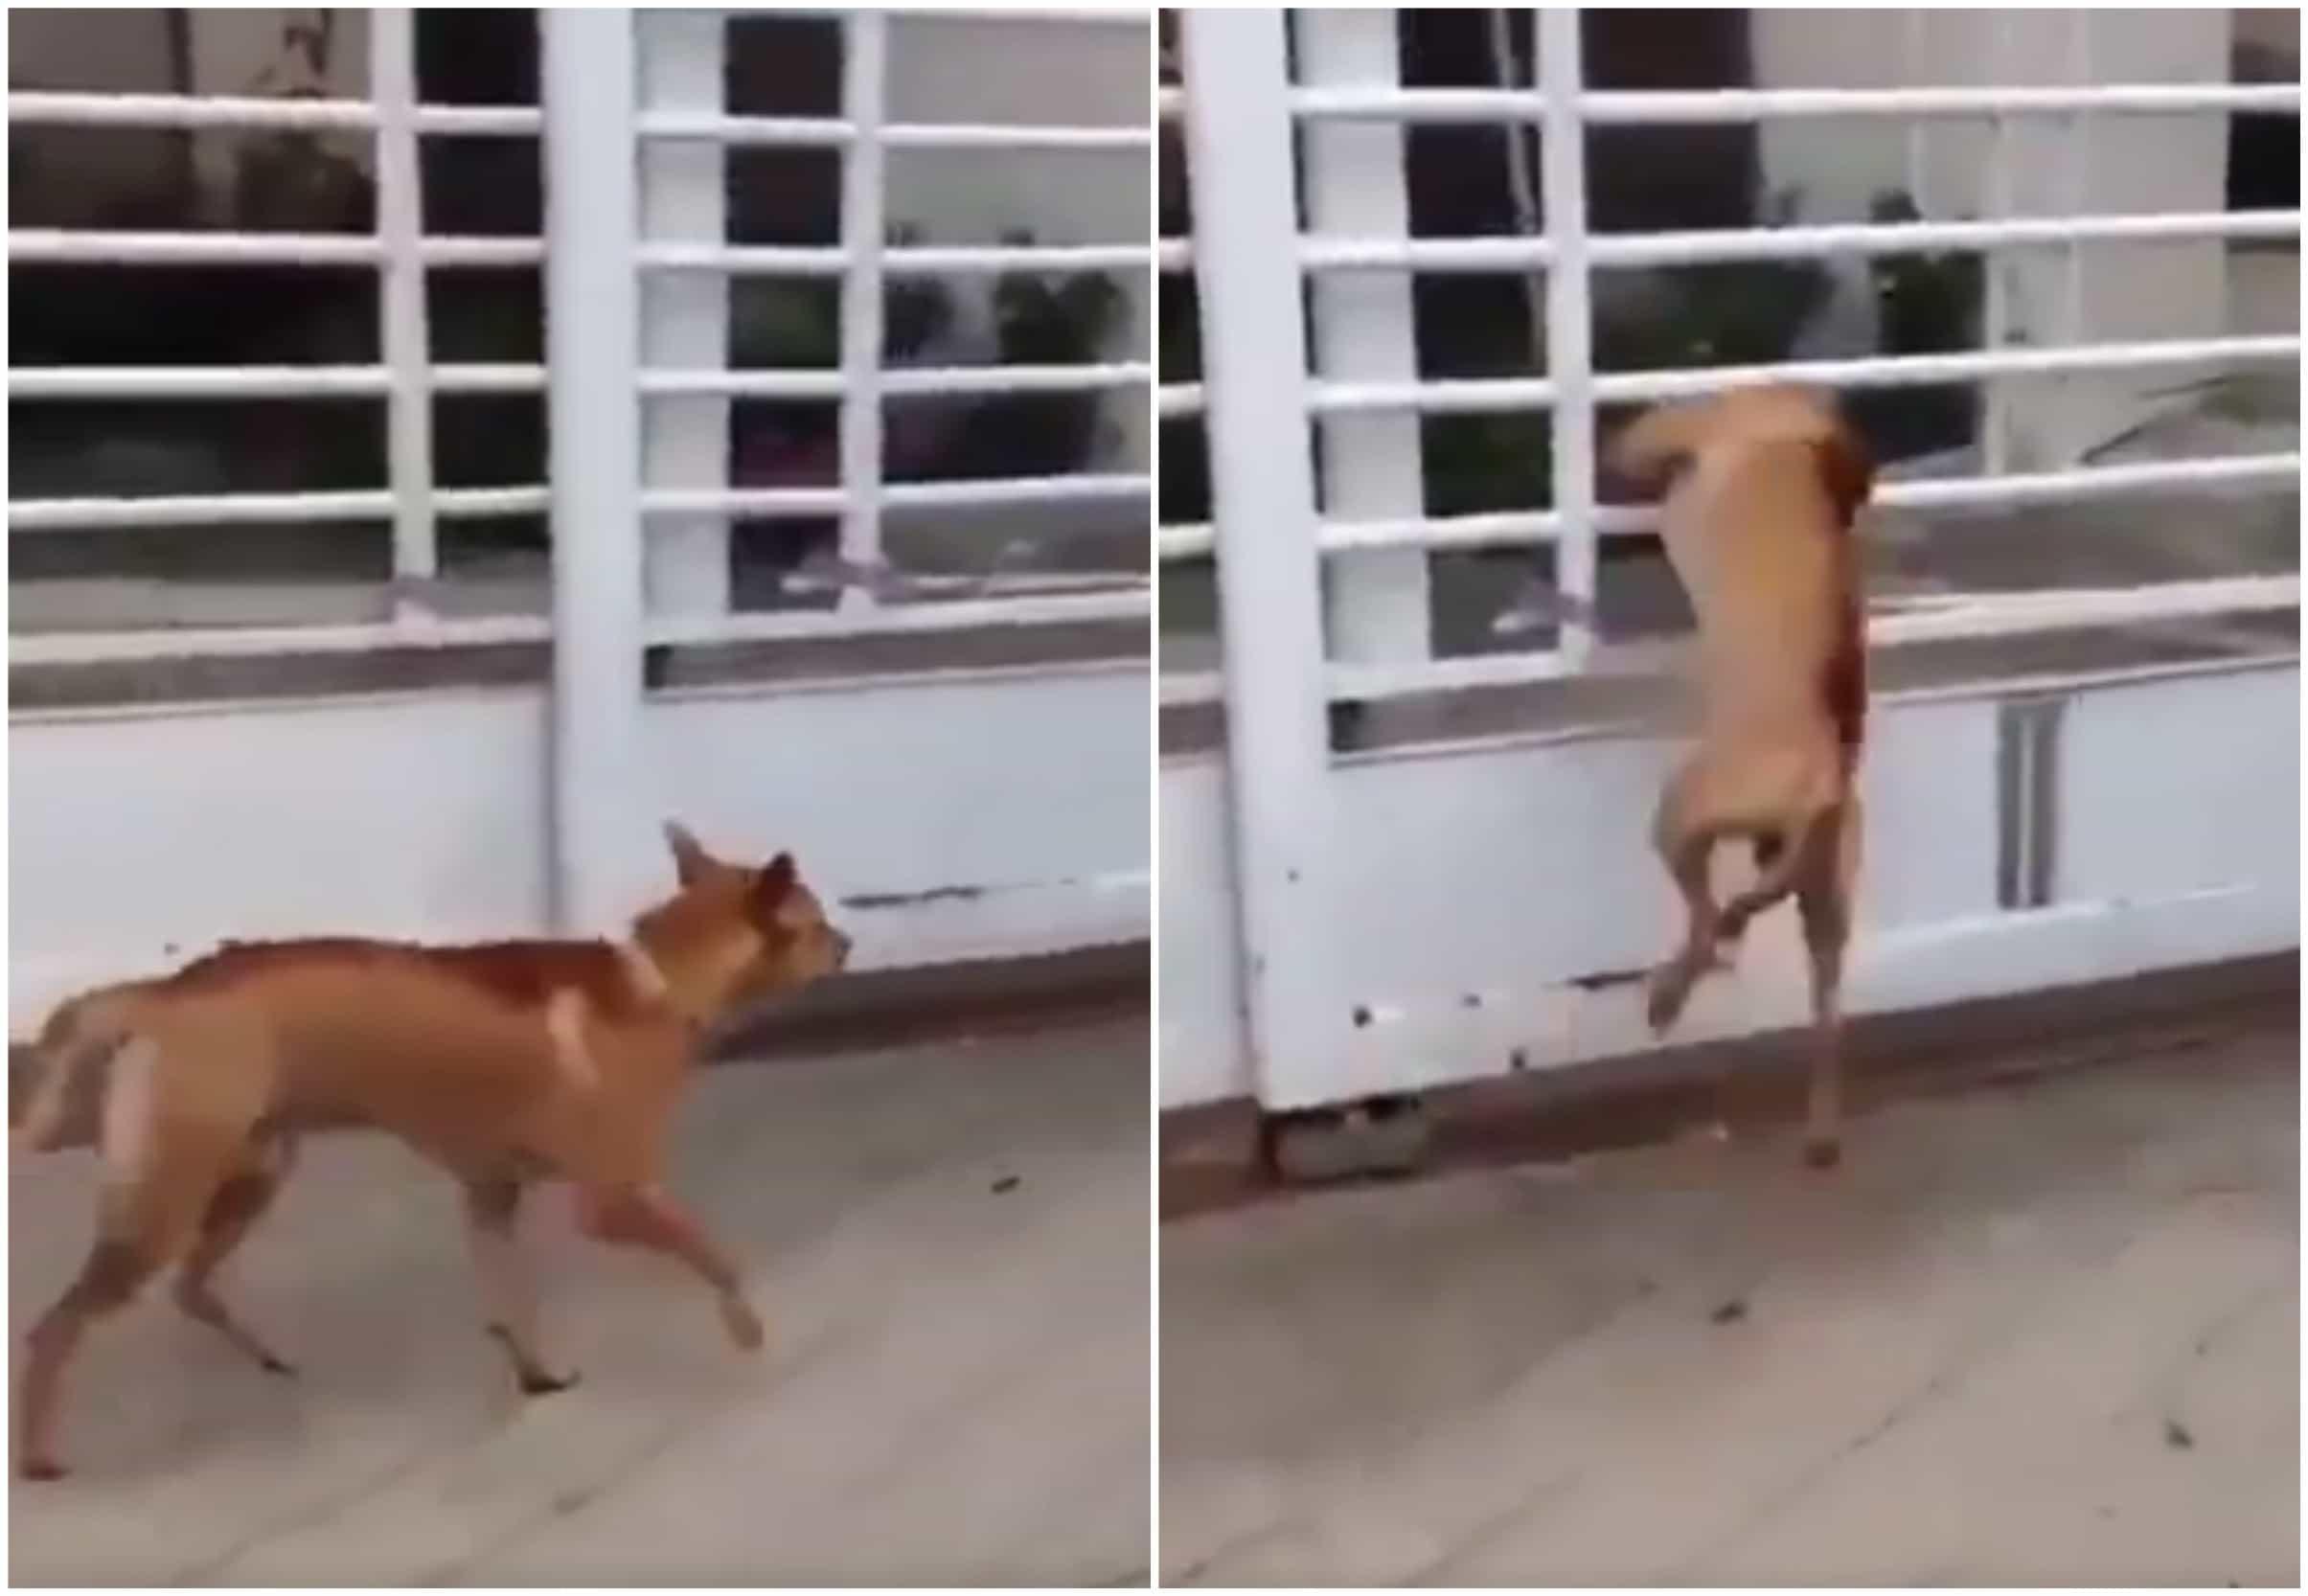 Perro atraviesa reja de casa. Pulzo.